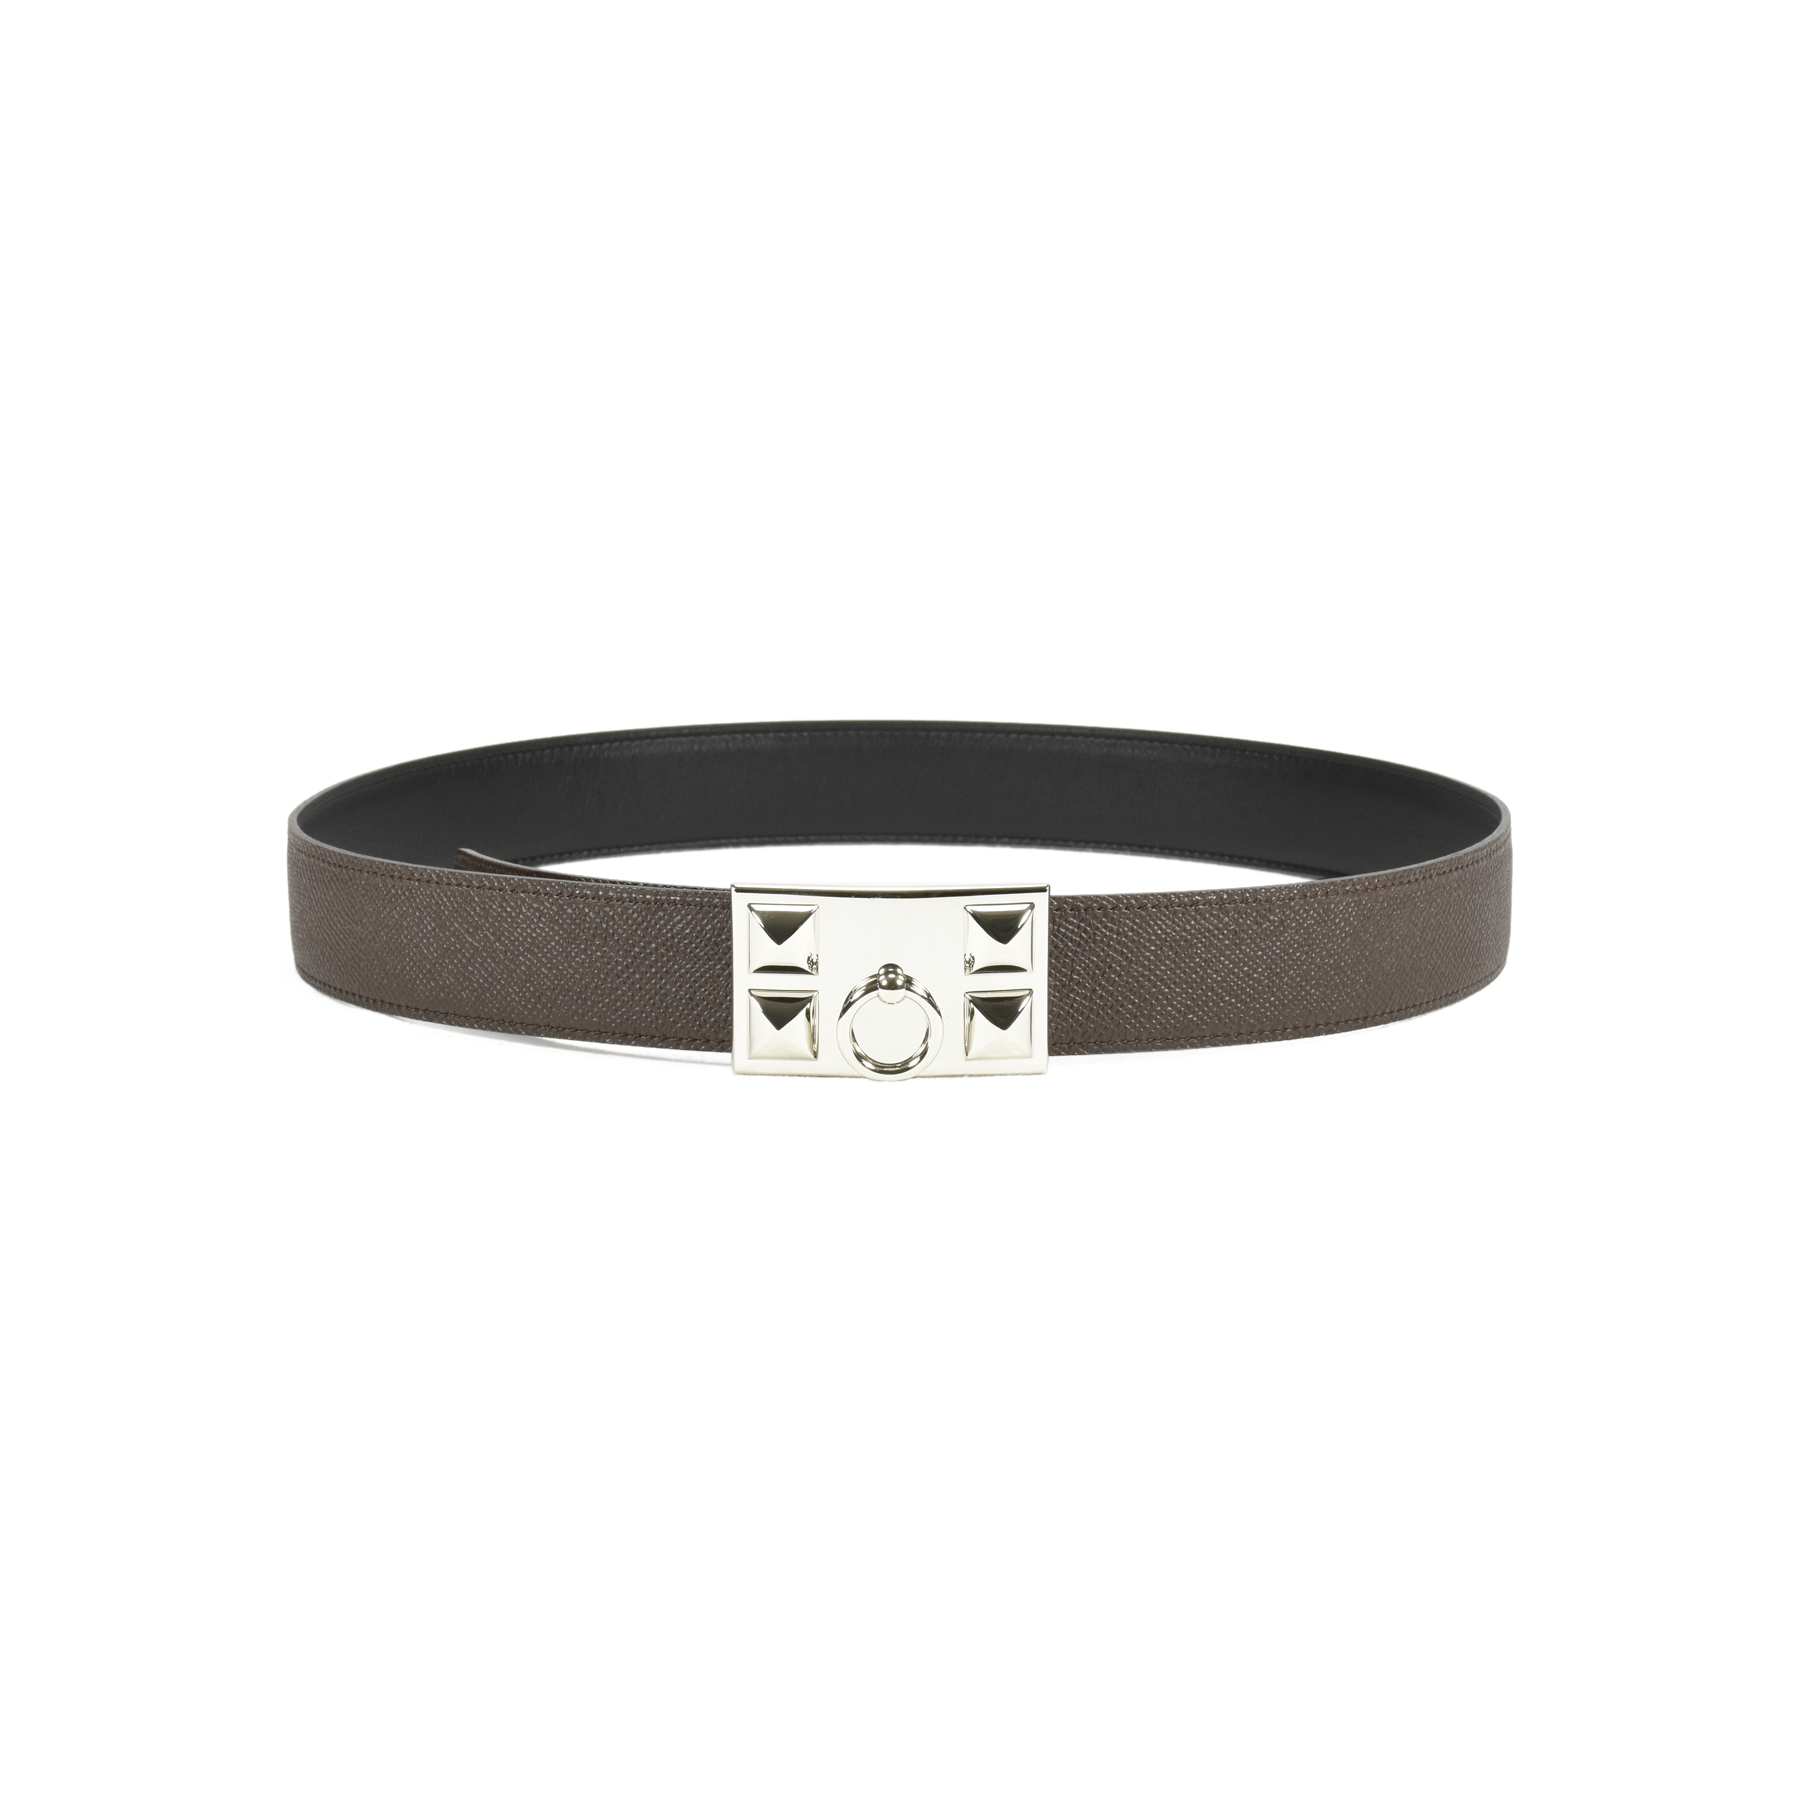 Second Hand Hermes Collier De Chien 32mm Belt Kit | THE